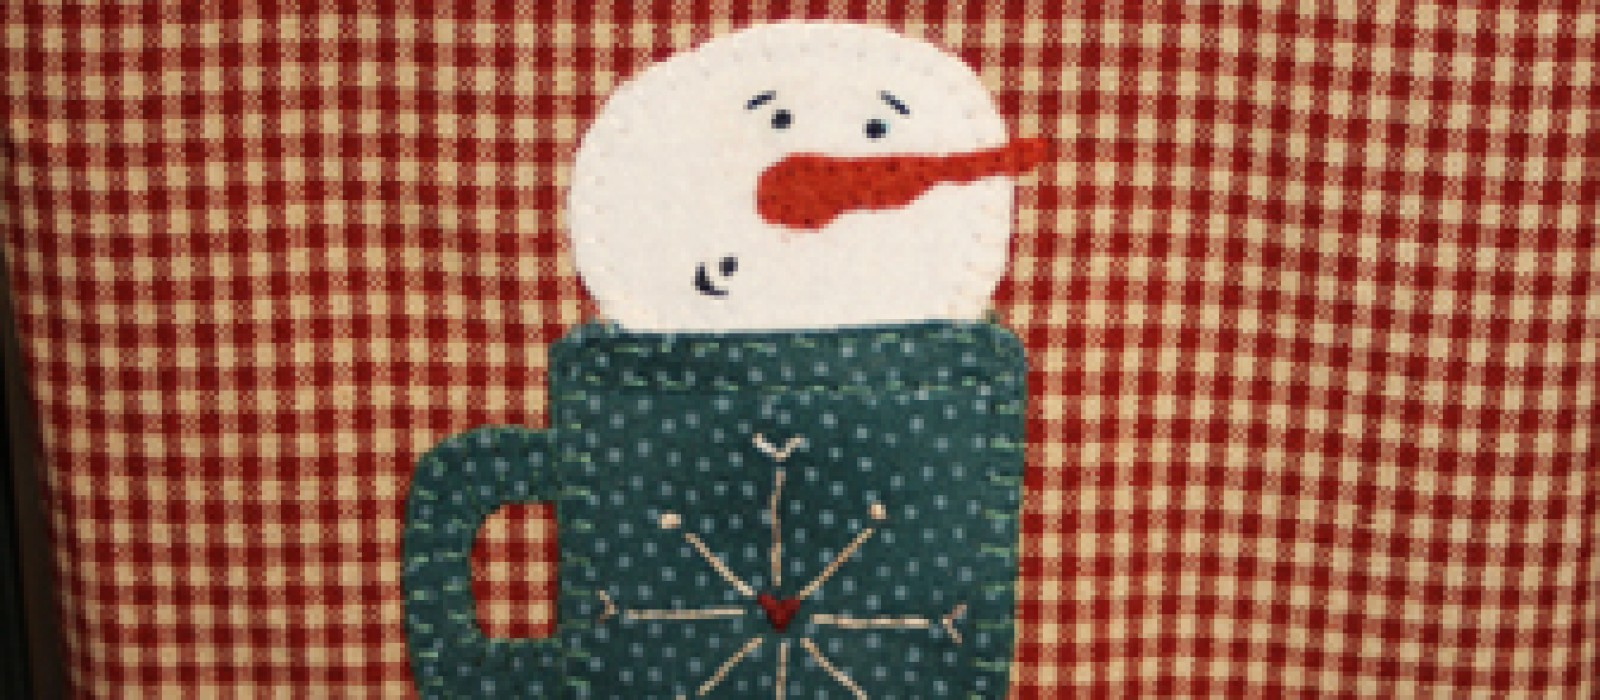 A FREE Melting Snowman?!?